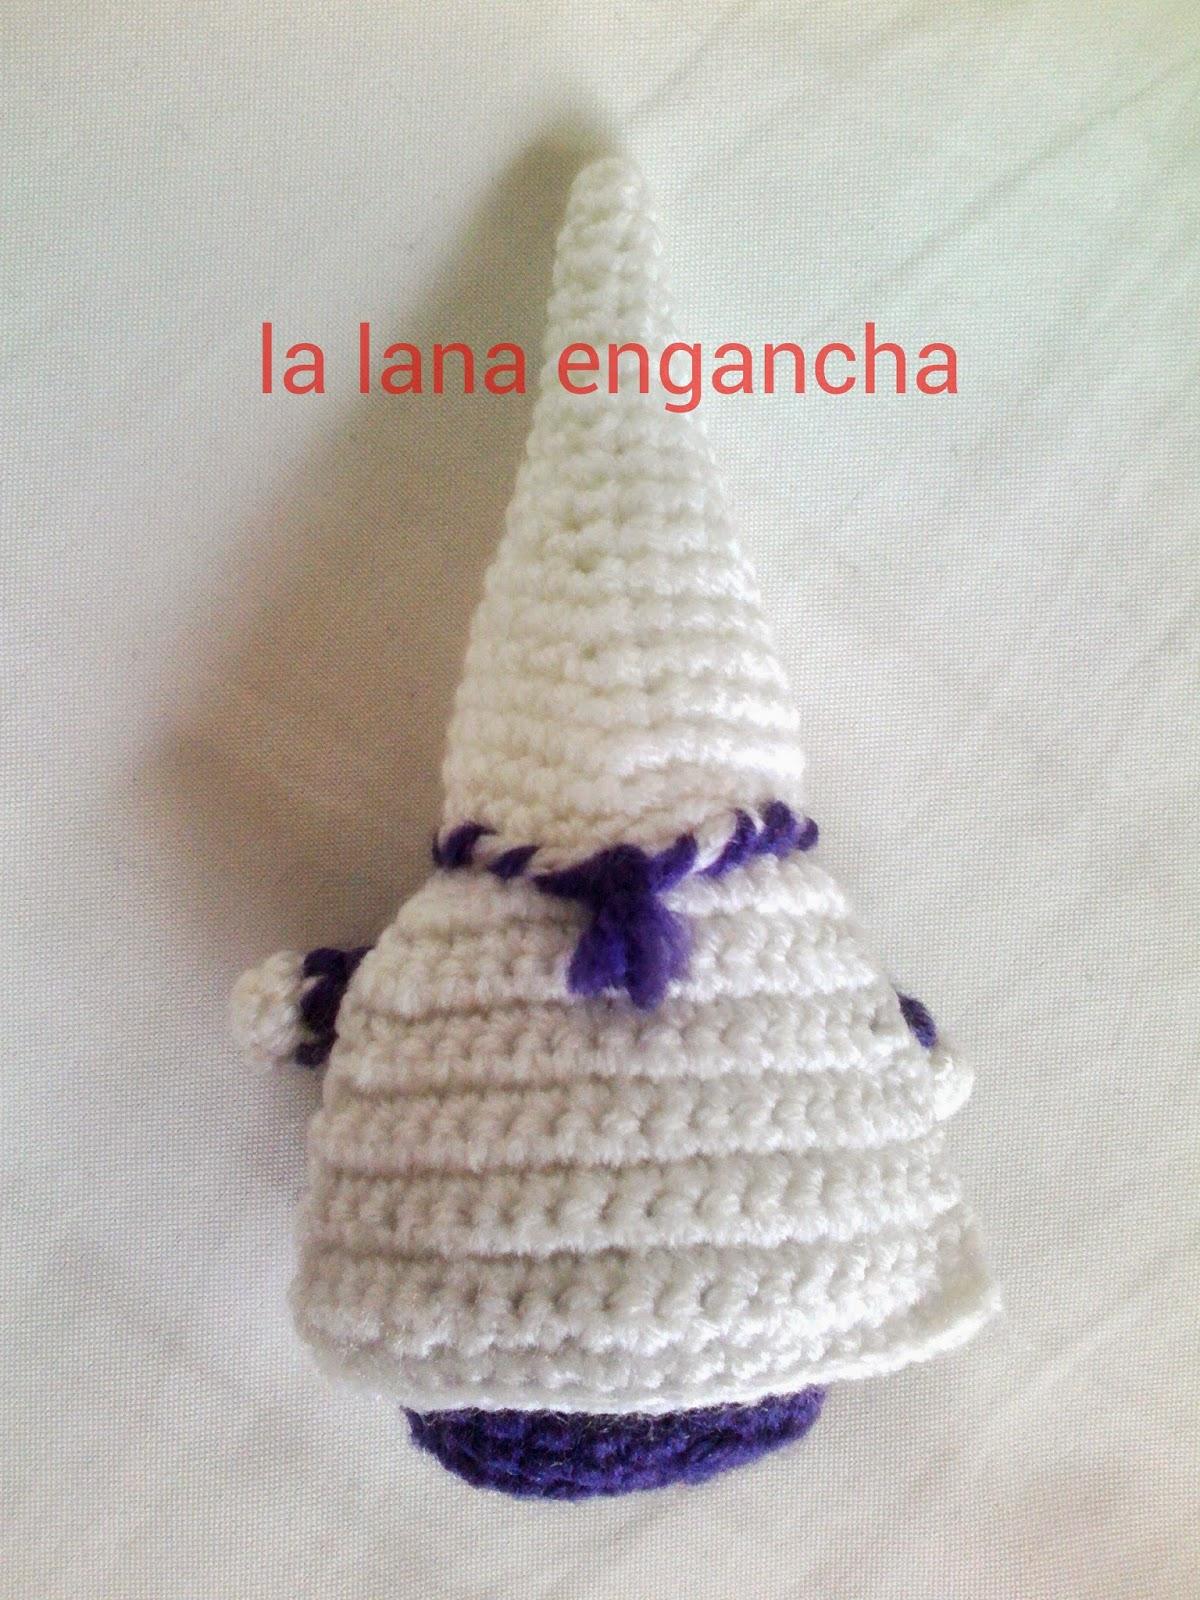 La lana engancha: NAZARENO